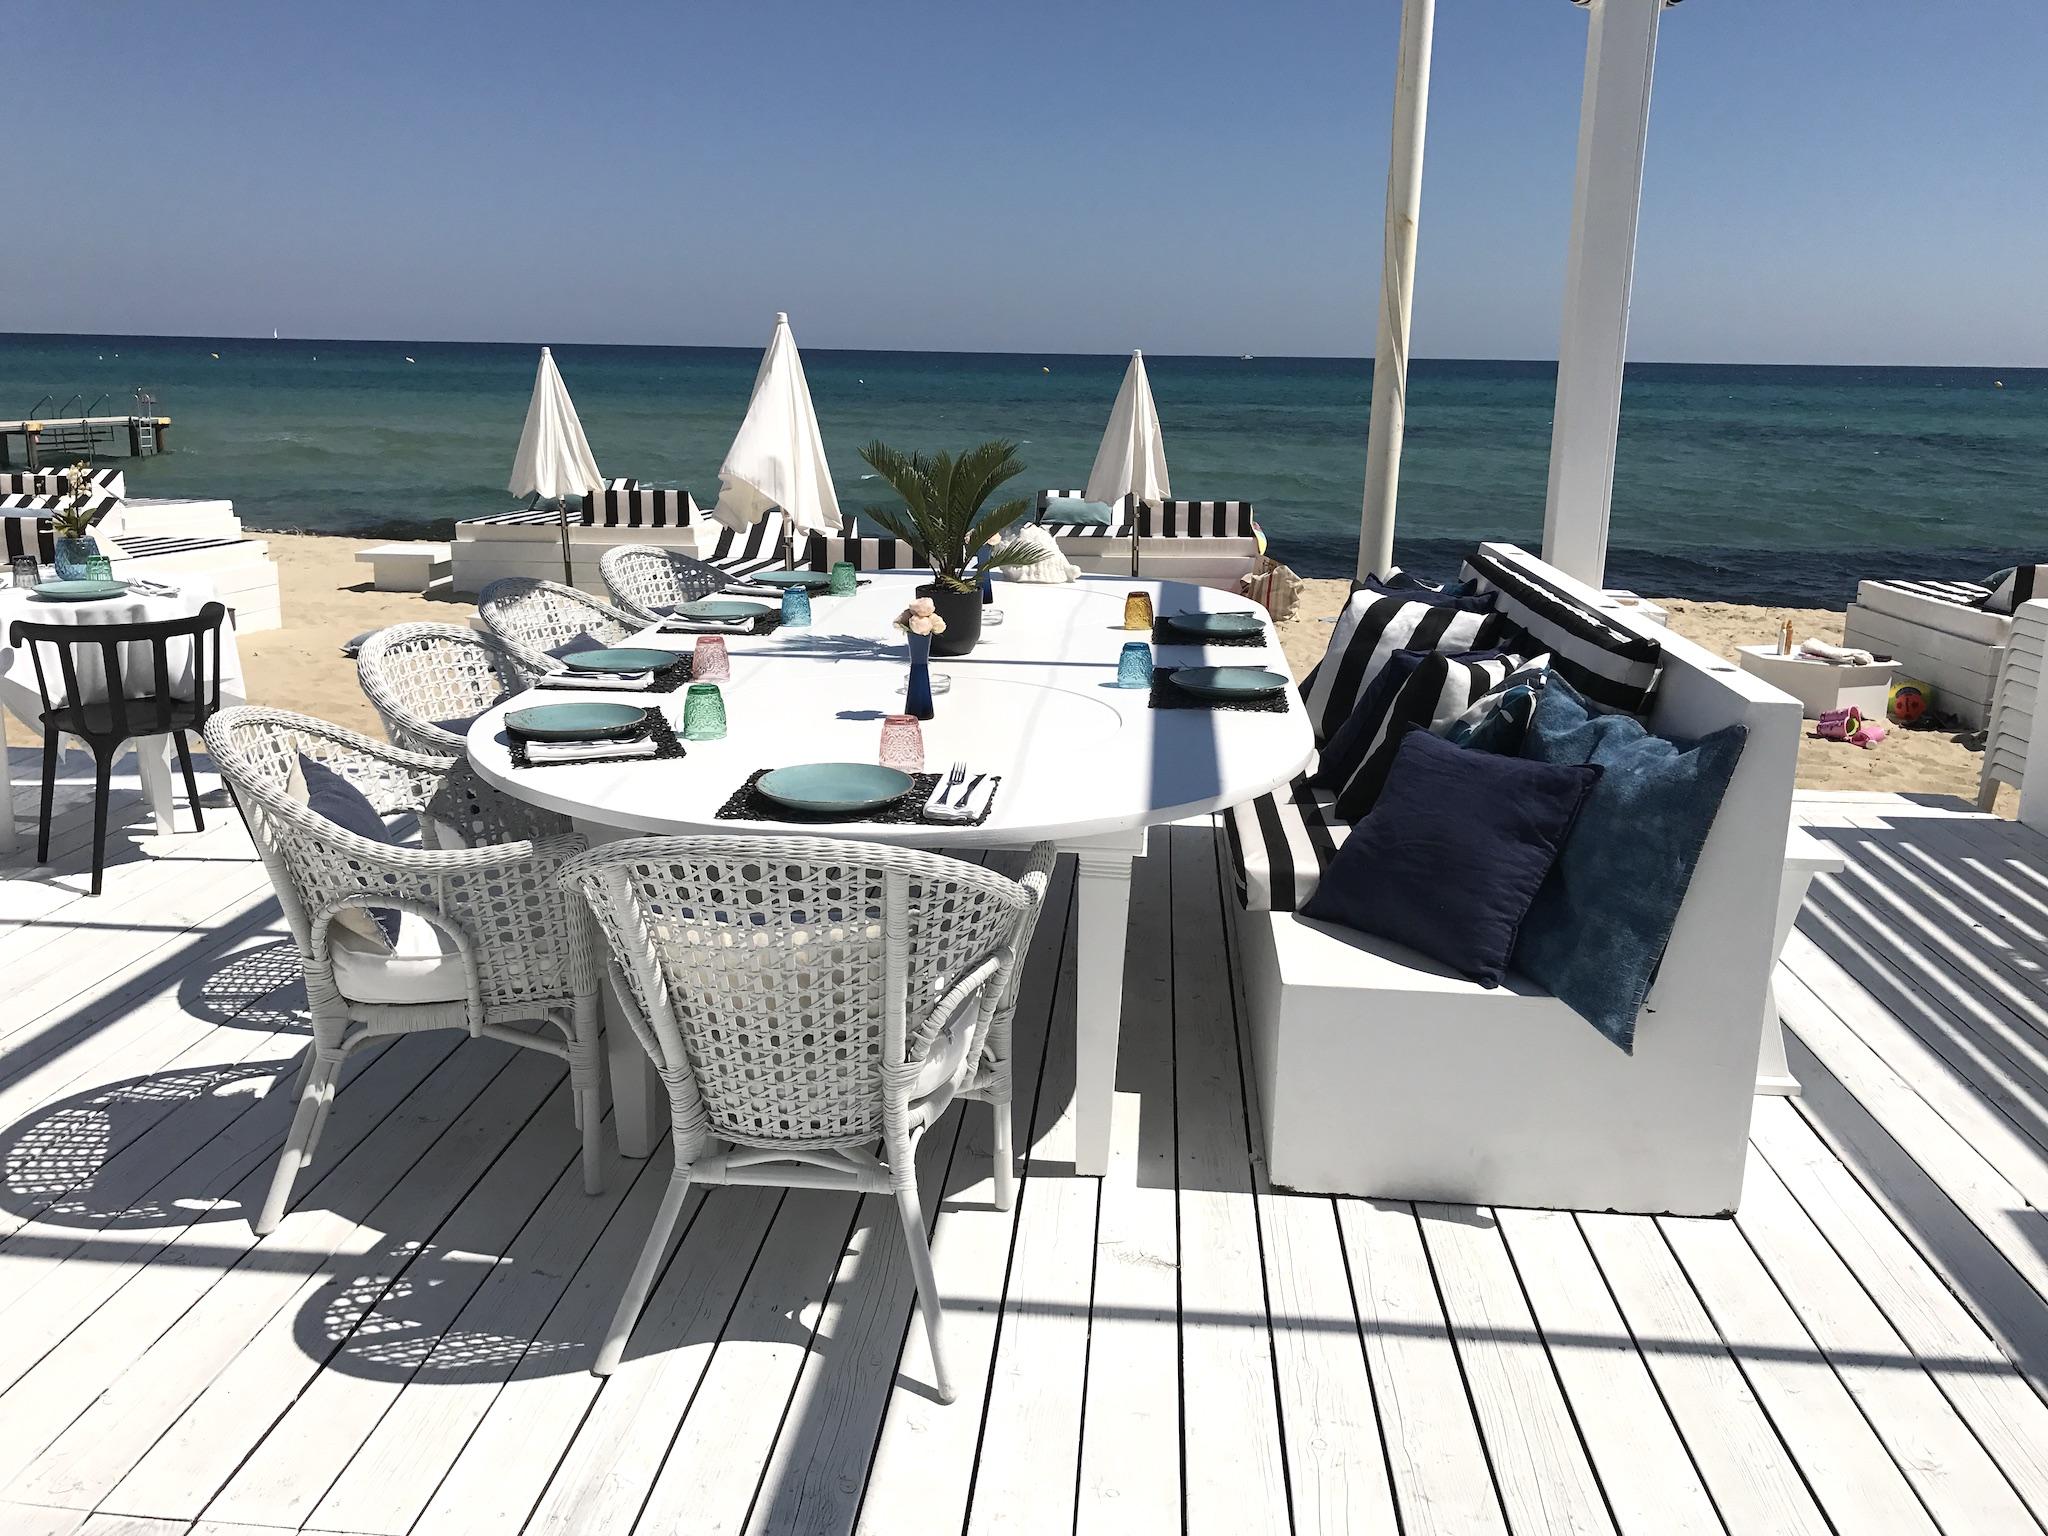 Maison Bianca Beach Club, Maison Bianca Saint Tropez, toller Beachclub St. Tropez, schöner Strand Club St. Tropez, Lifestyle-Blog, Lieblingstil.com